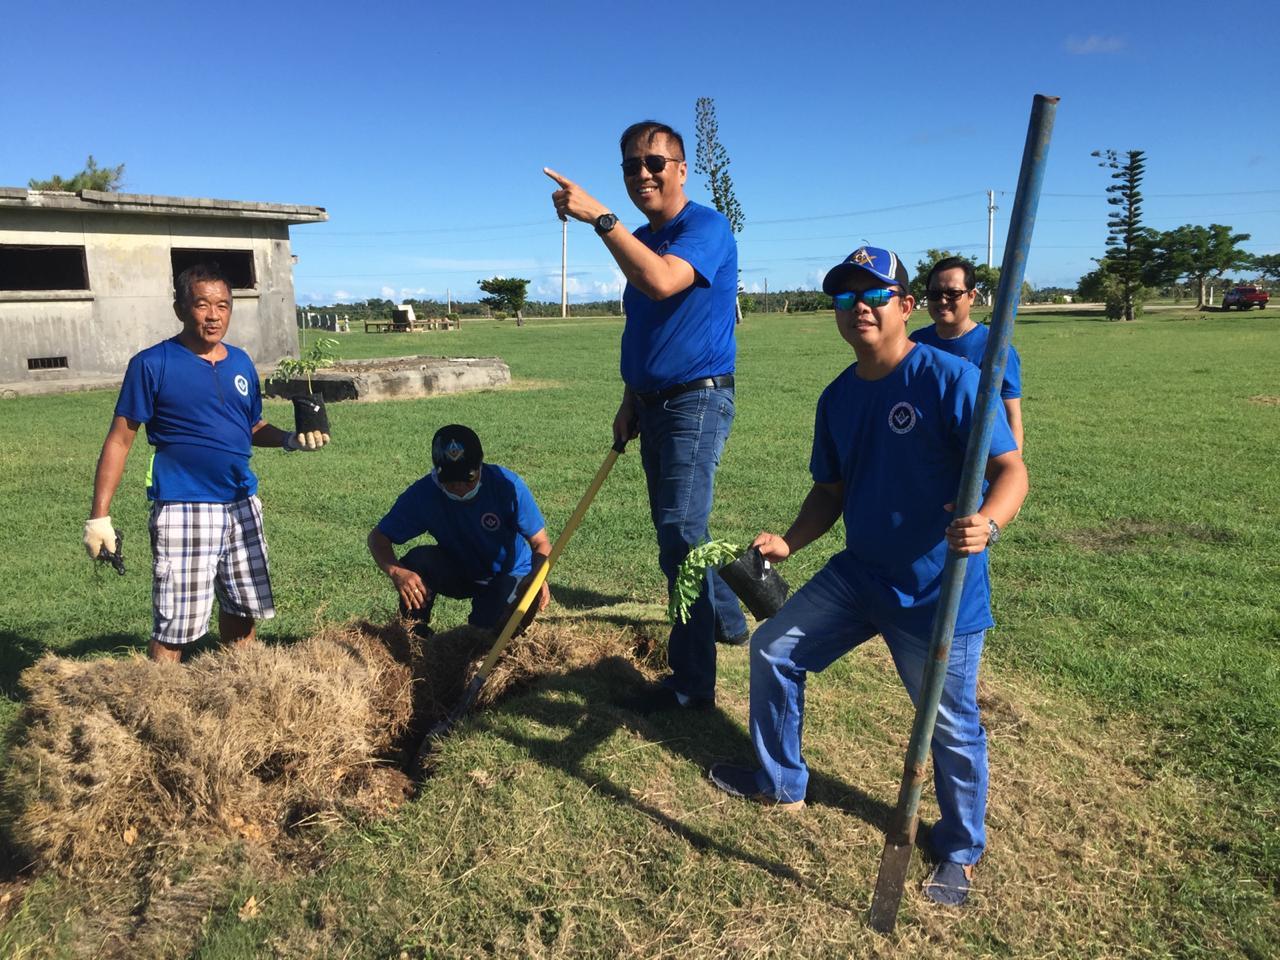 Micronesia - Freemasons plant trees to help keep Saipan green